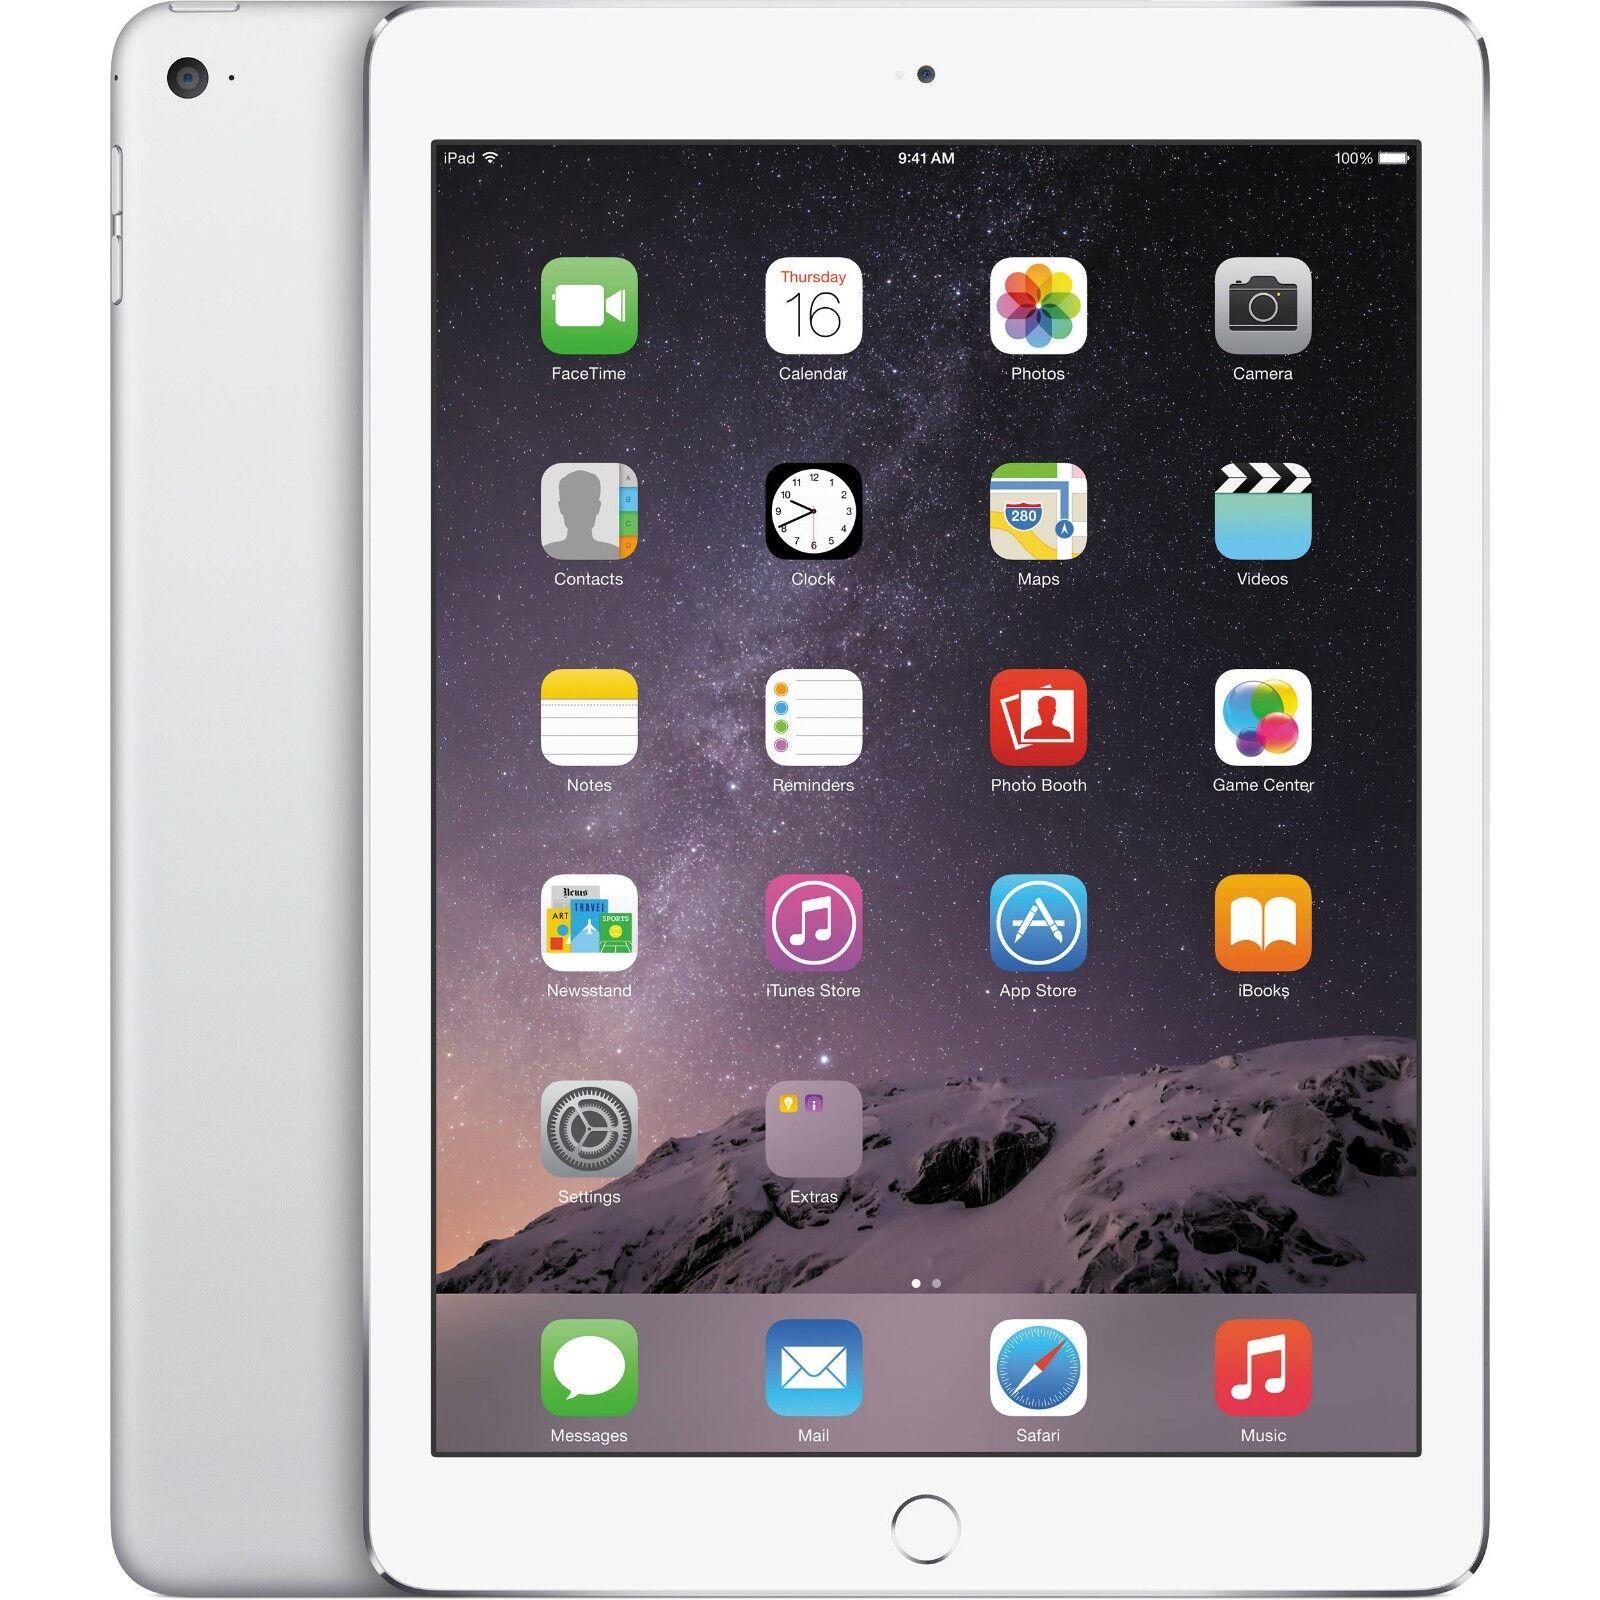 Apple 9.7 iPad Air 2 128GB Wi-Fi Silver MGTY2LL/A With Touch ID Retina Display